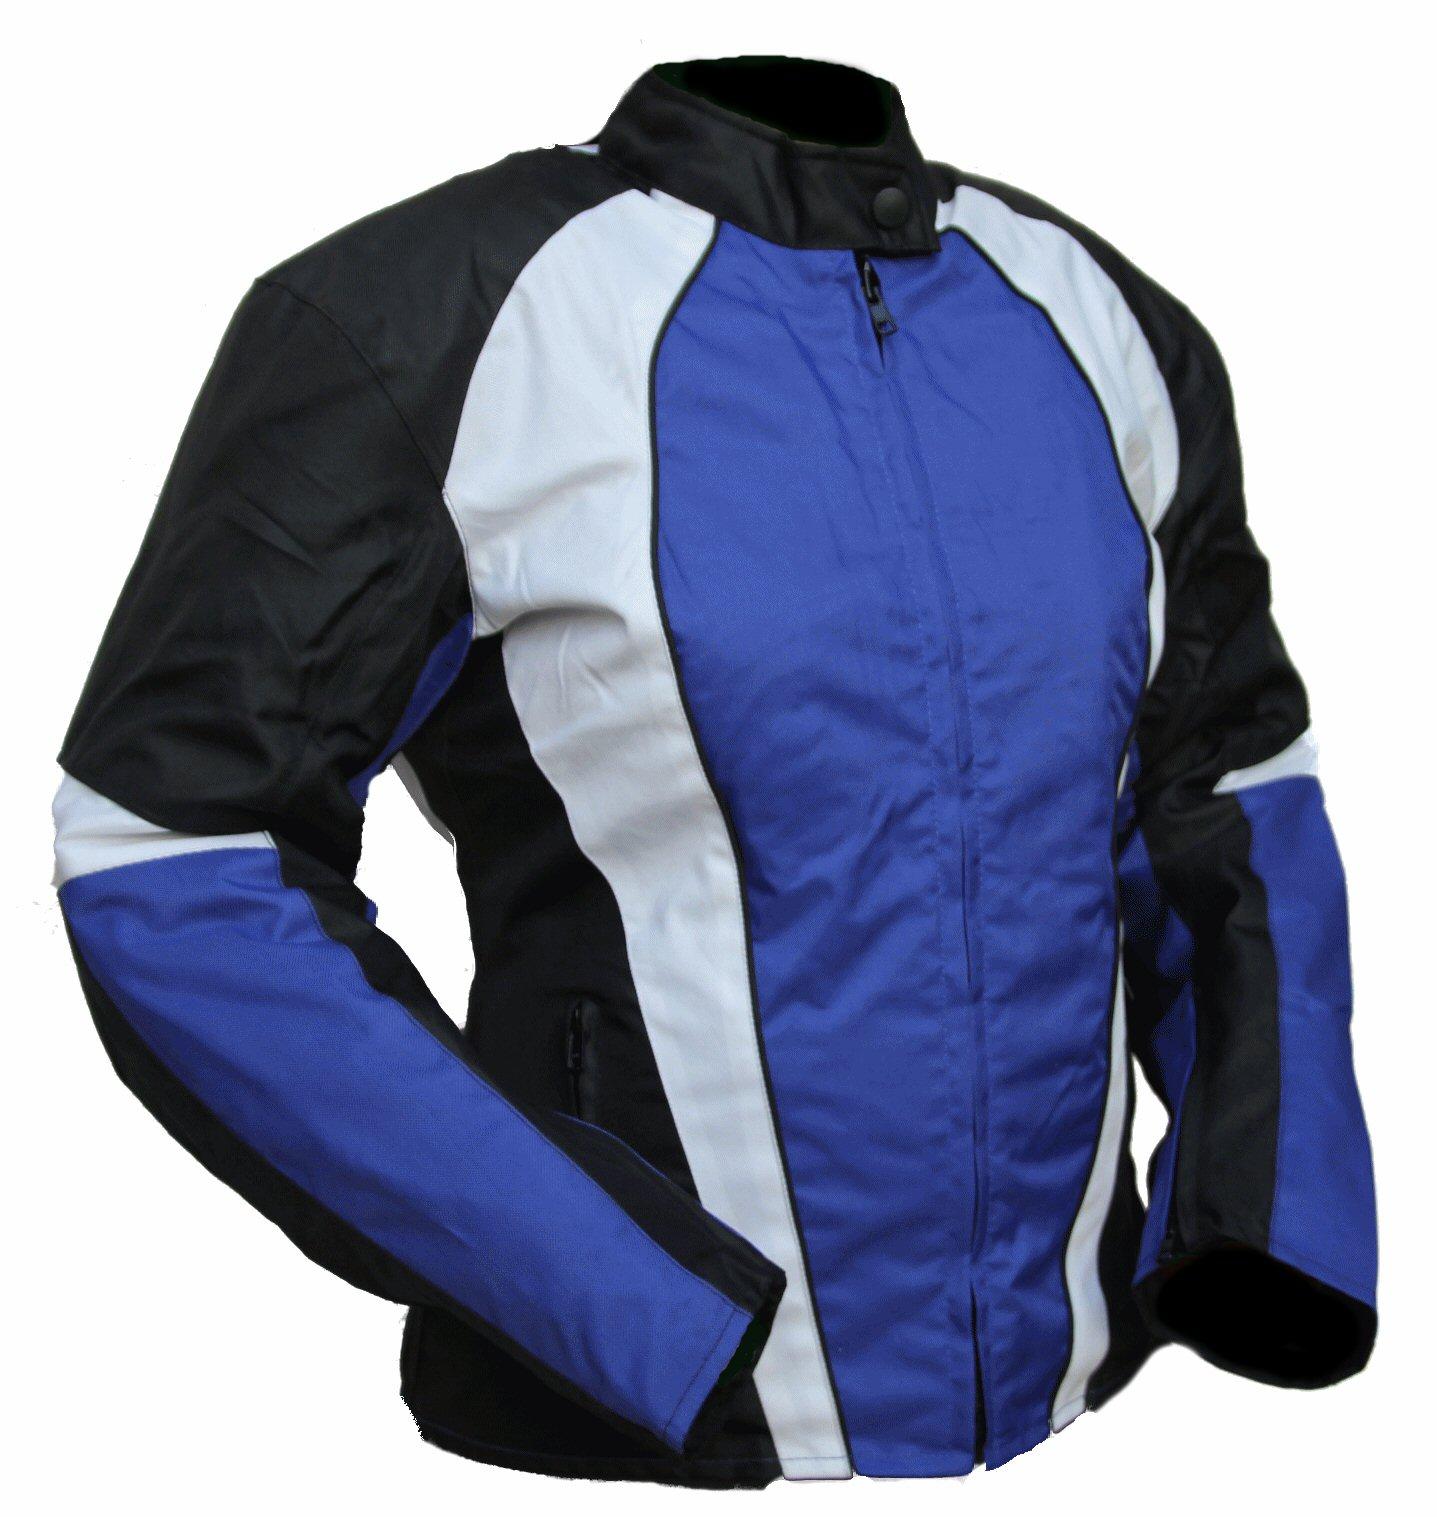 Blouson moto : choisir un joli blouson